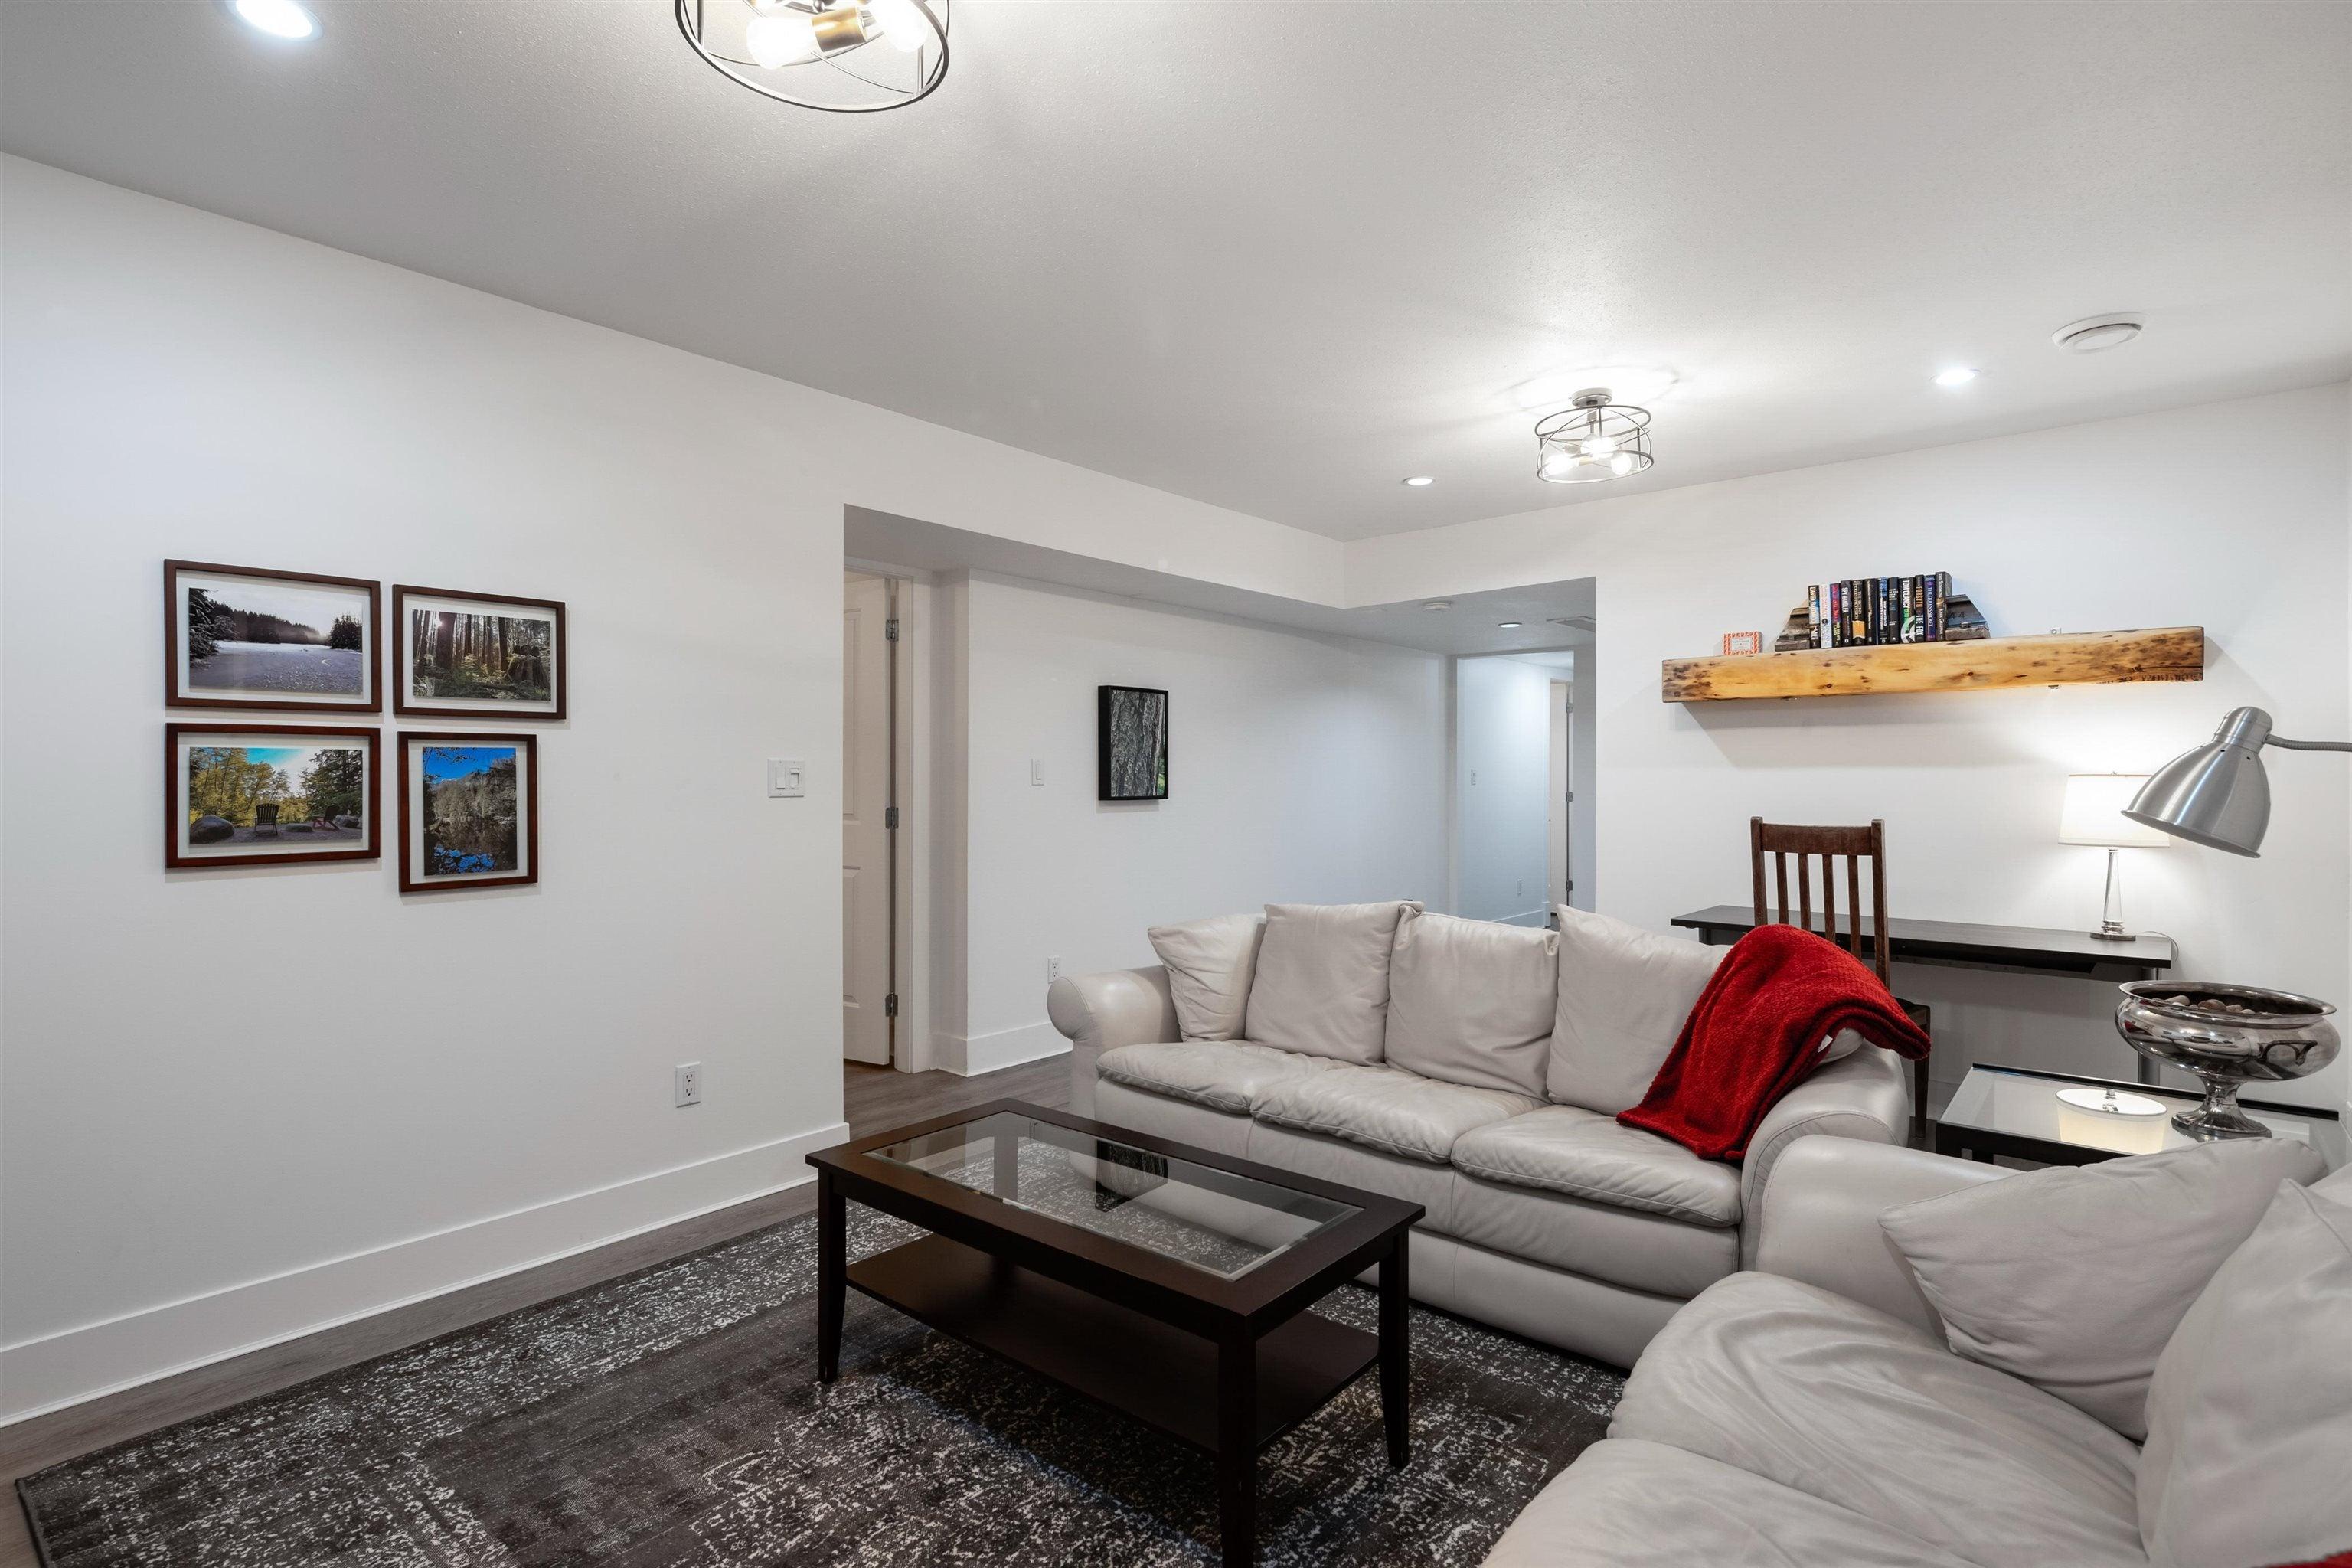 2258 WINDRIDGE DRIVE - Seymour NV House/Single Family for sale, 5 Bedrooms (R2617156) - #27